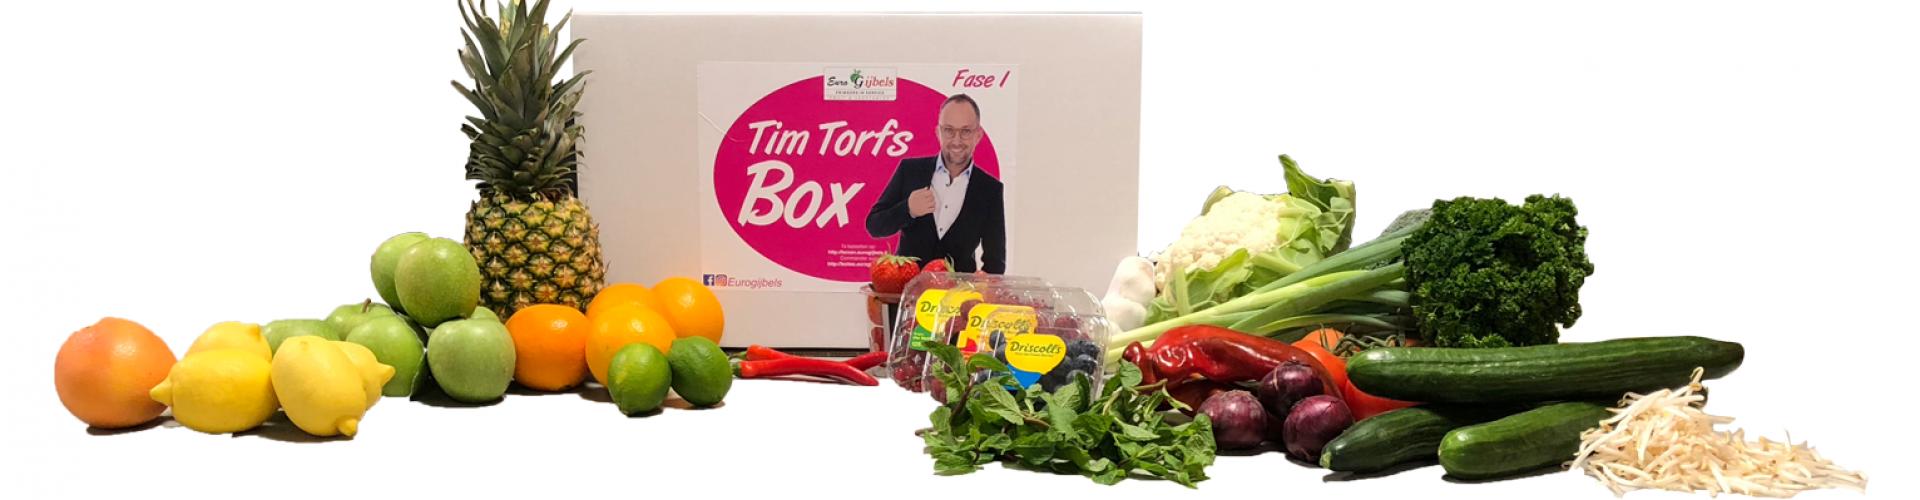 Tim Torfs Box